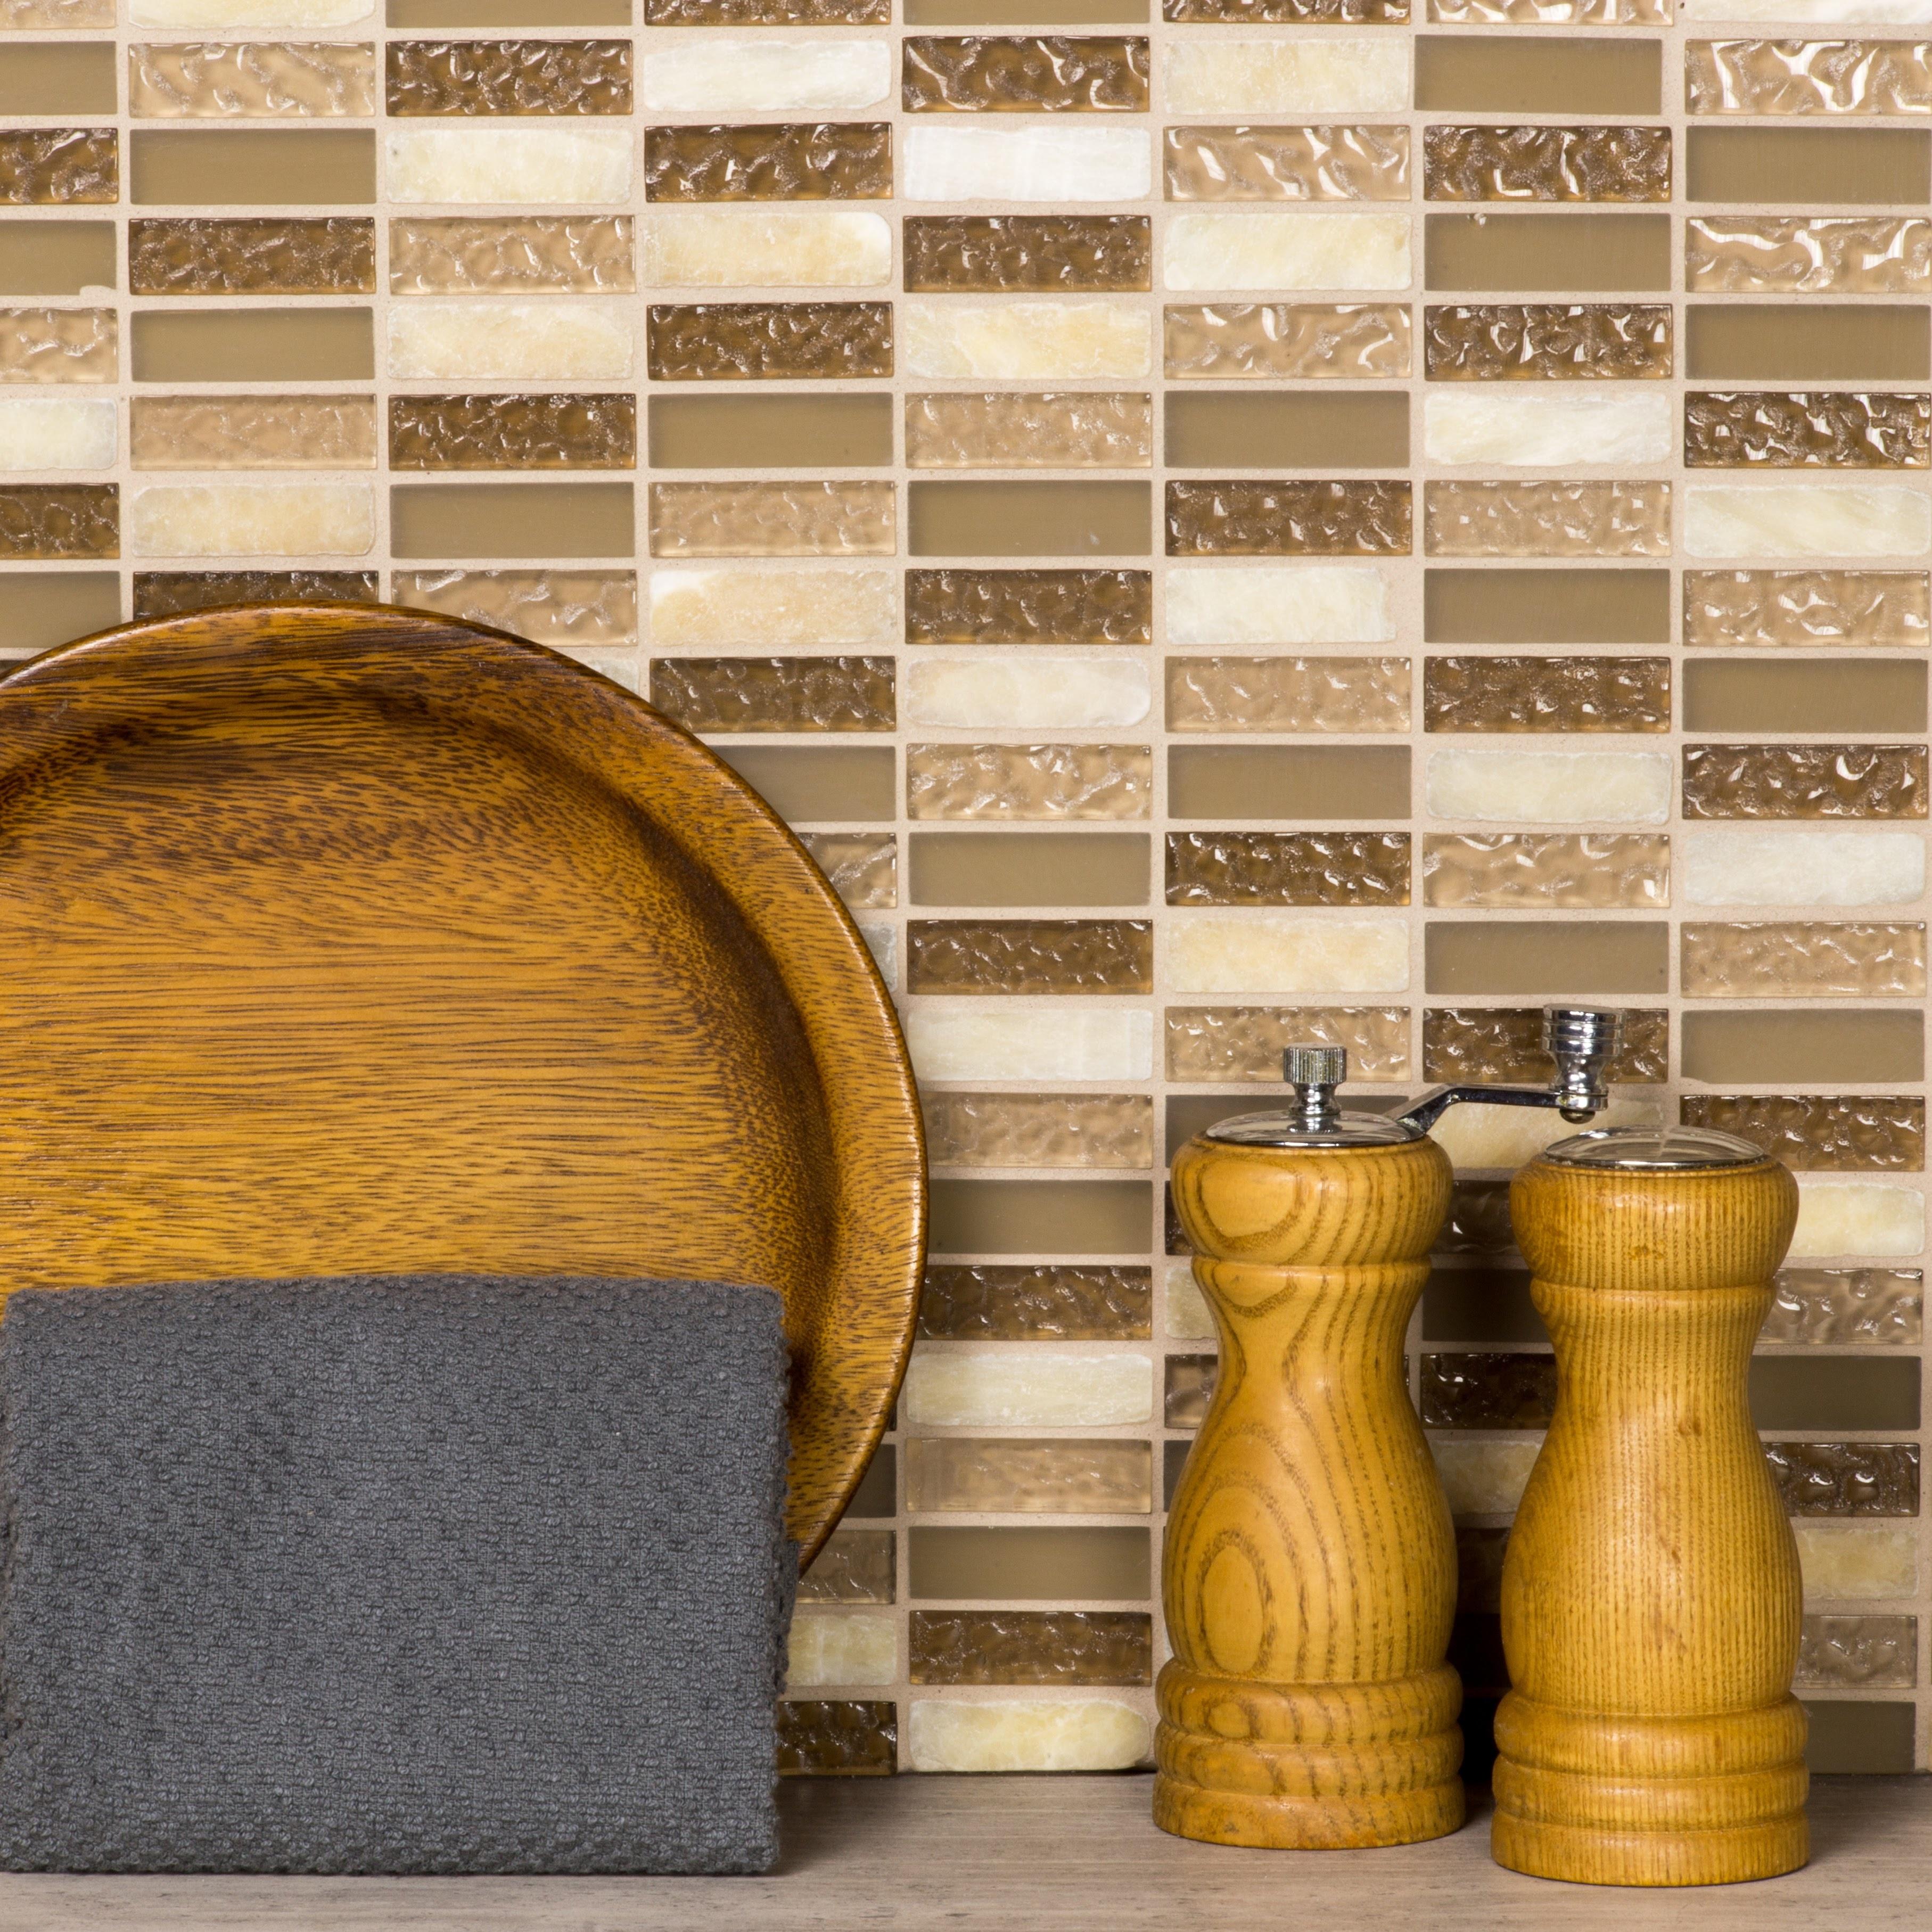 "Quartz 0.625"" x 2"" Multi Finish Beige Glass and Stone Rectangle Backsplash Mosaic Wall & Floor Tile"